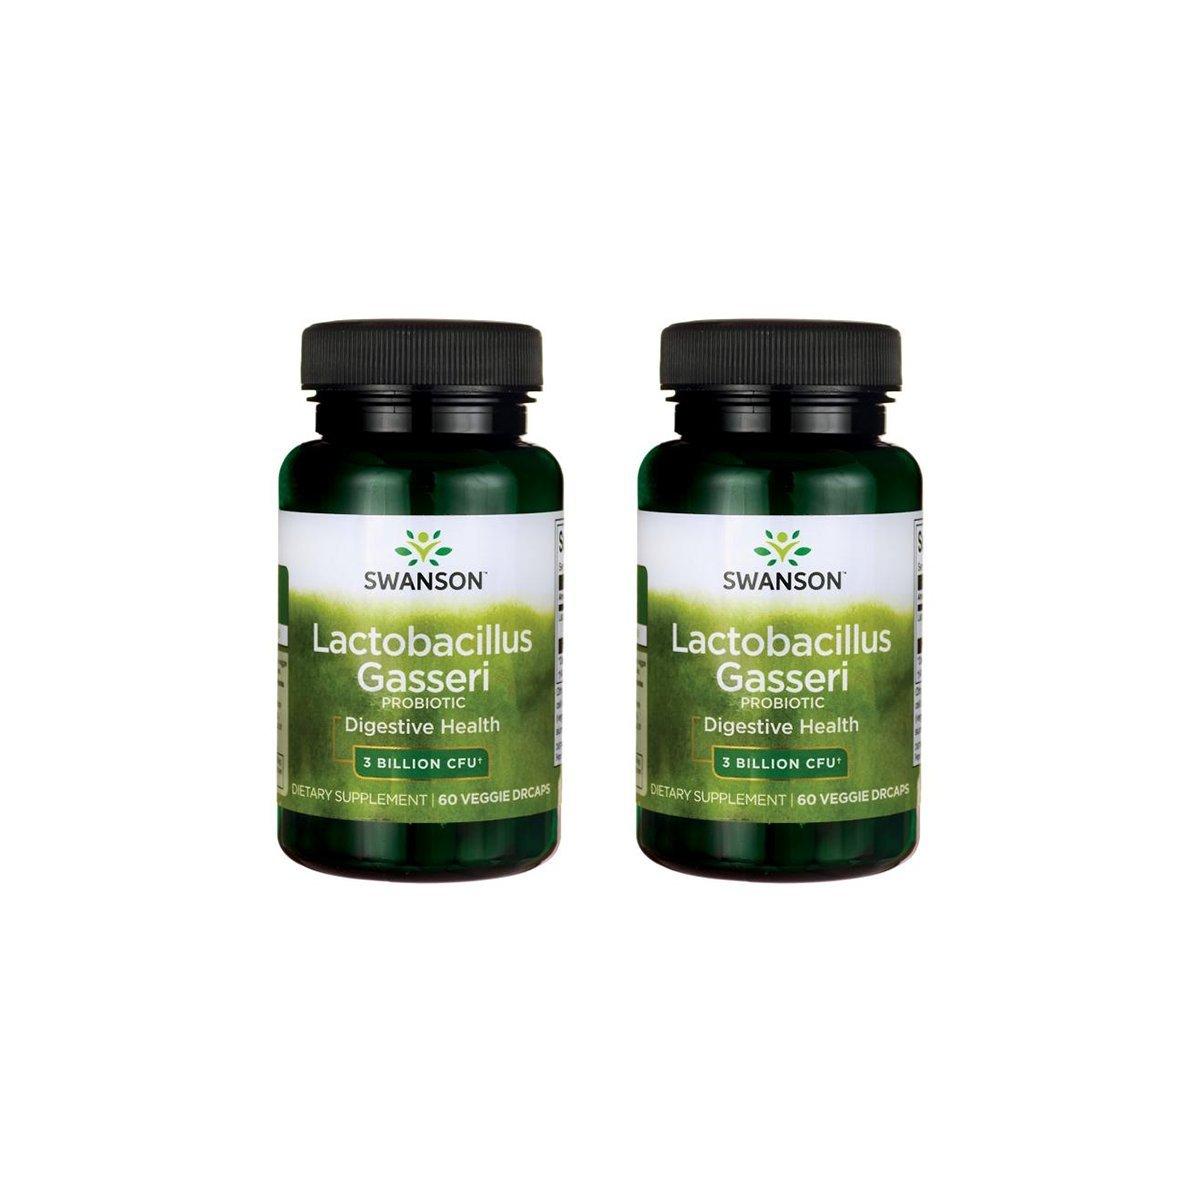 Swanson Lactobacillus Gasseri 3 Billion CFU Digestive Health Fat Metabolism Satiety Probiotic Supplement 60 Veggie Capsules (Acid-Resistant Designed-Release) (2 Pack)